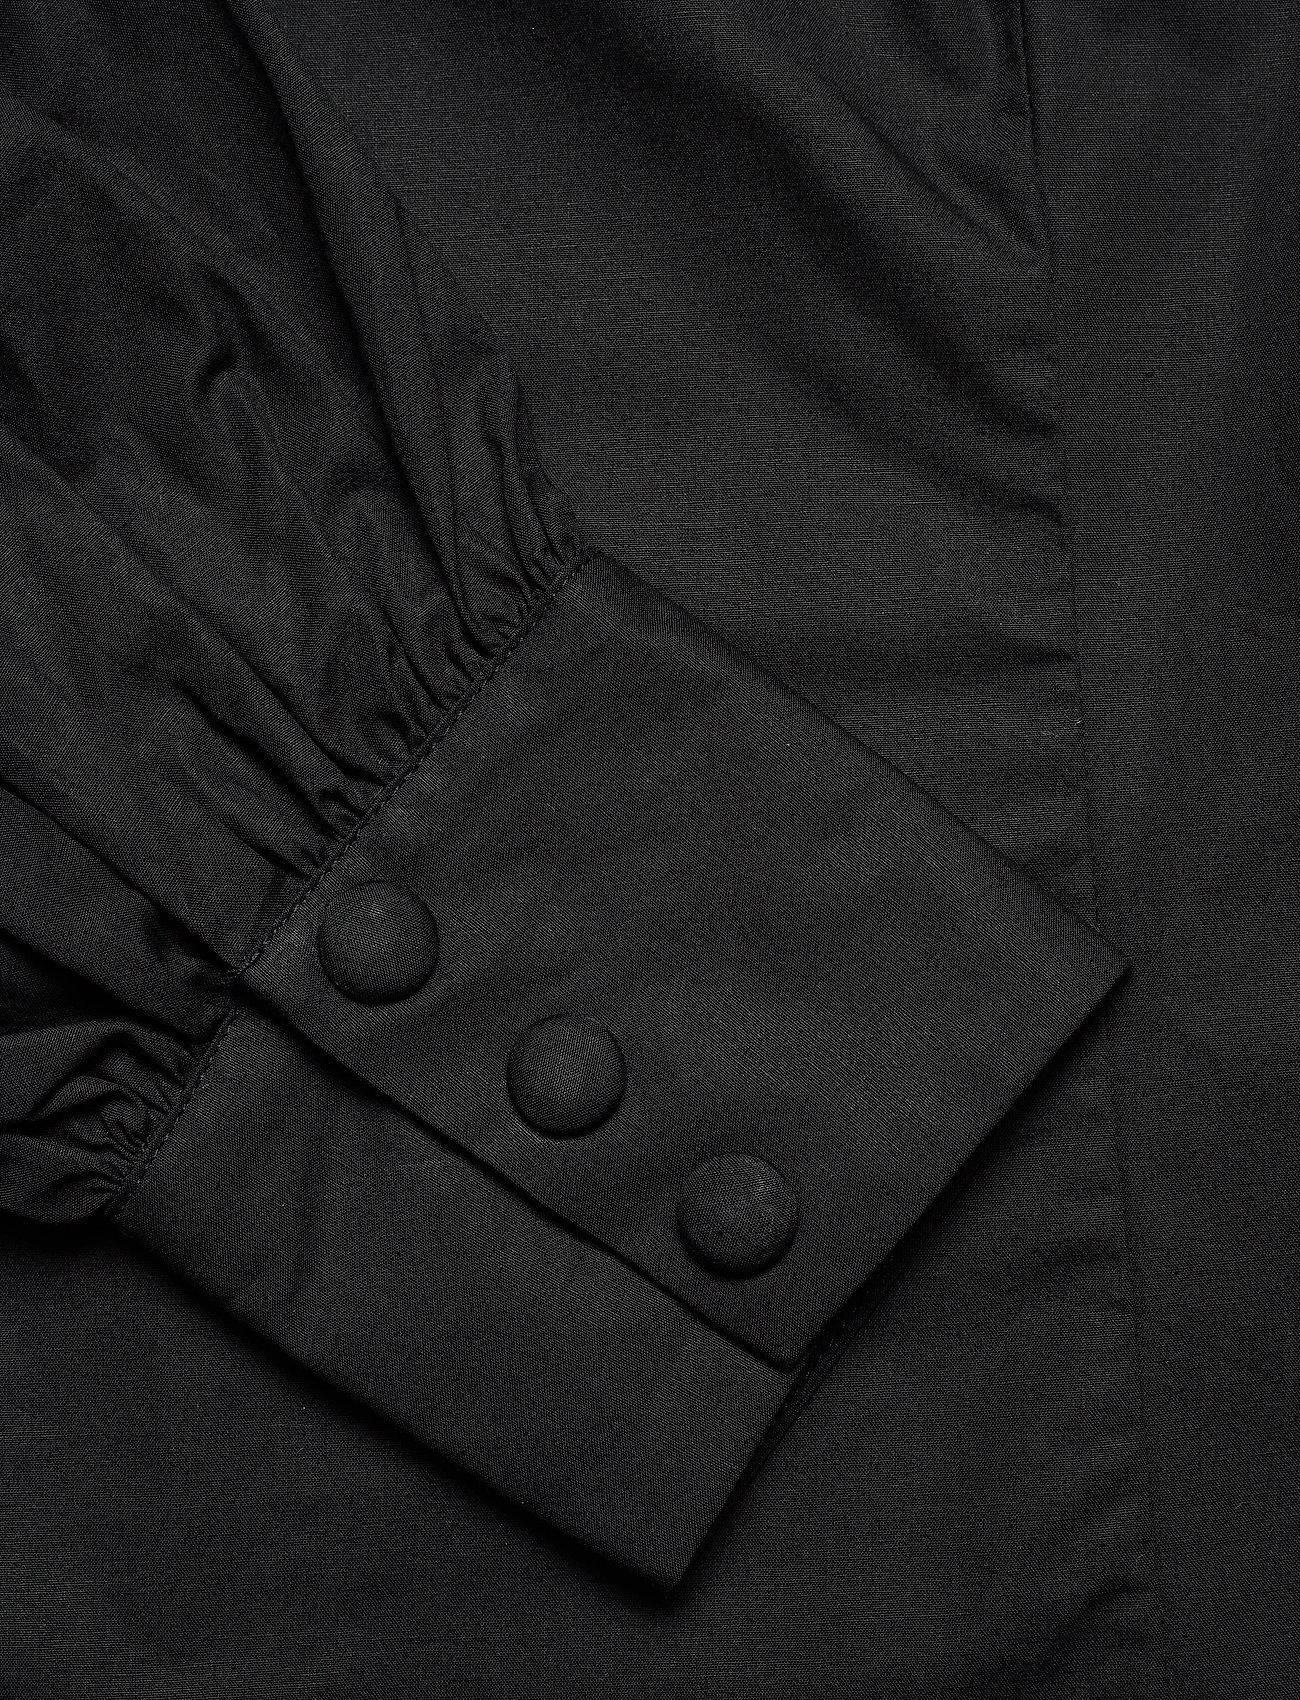 Elvanagz Blouse Ma20 (Black) (81.75 €) - Gestuz px7zZ